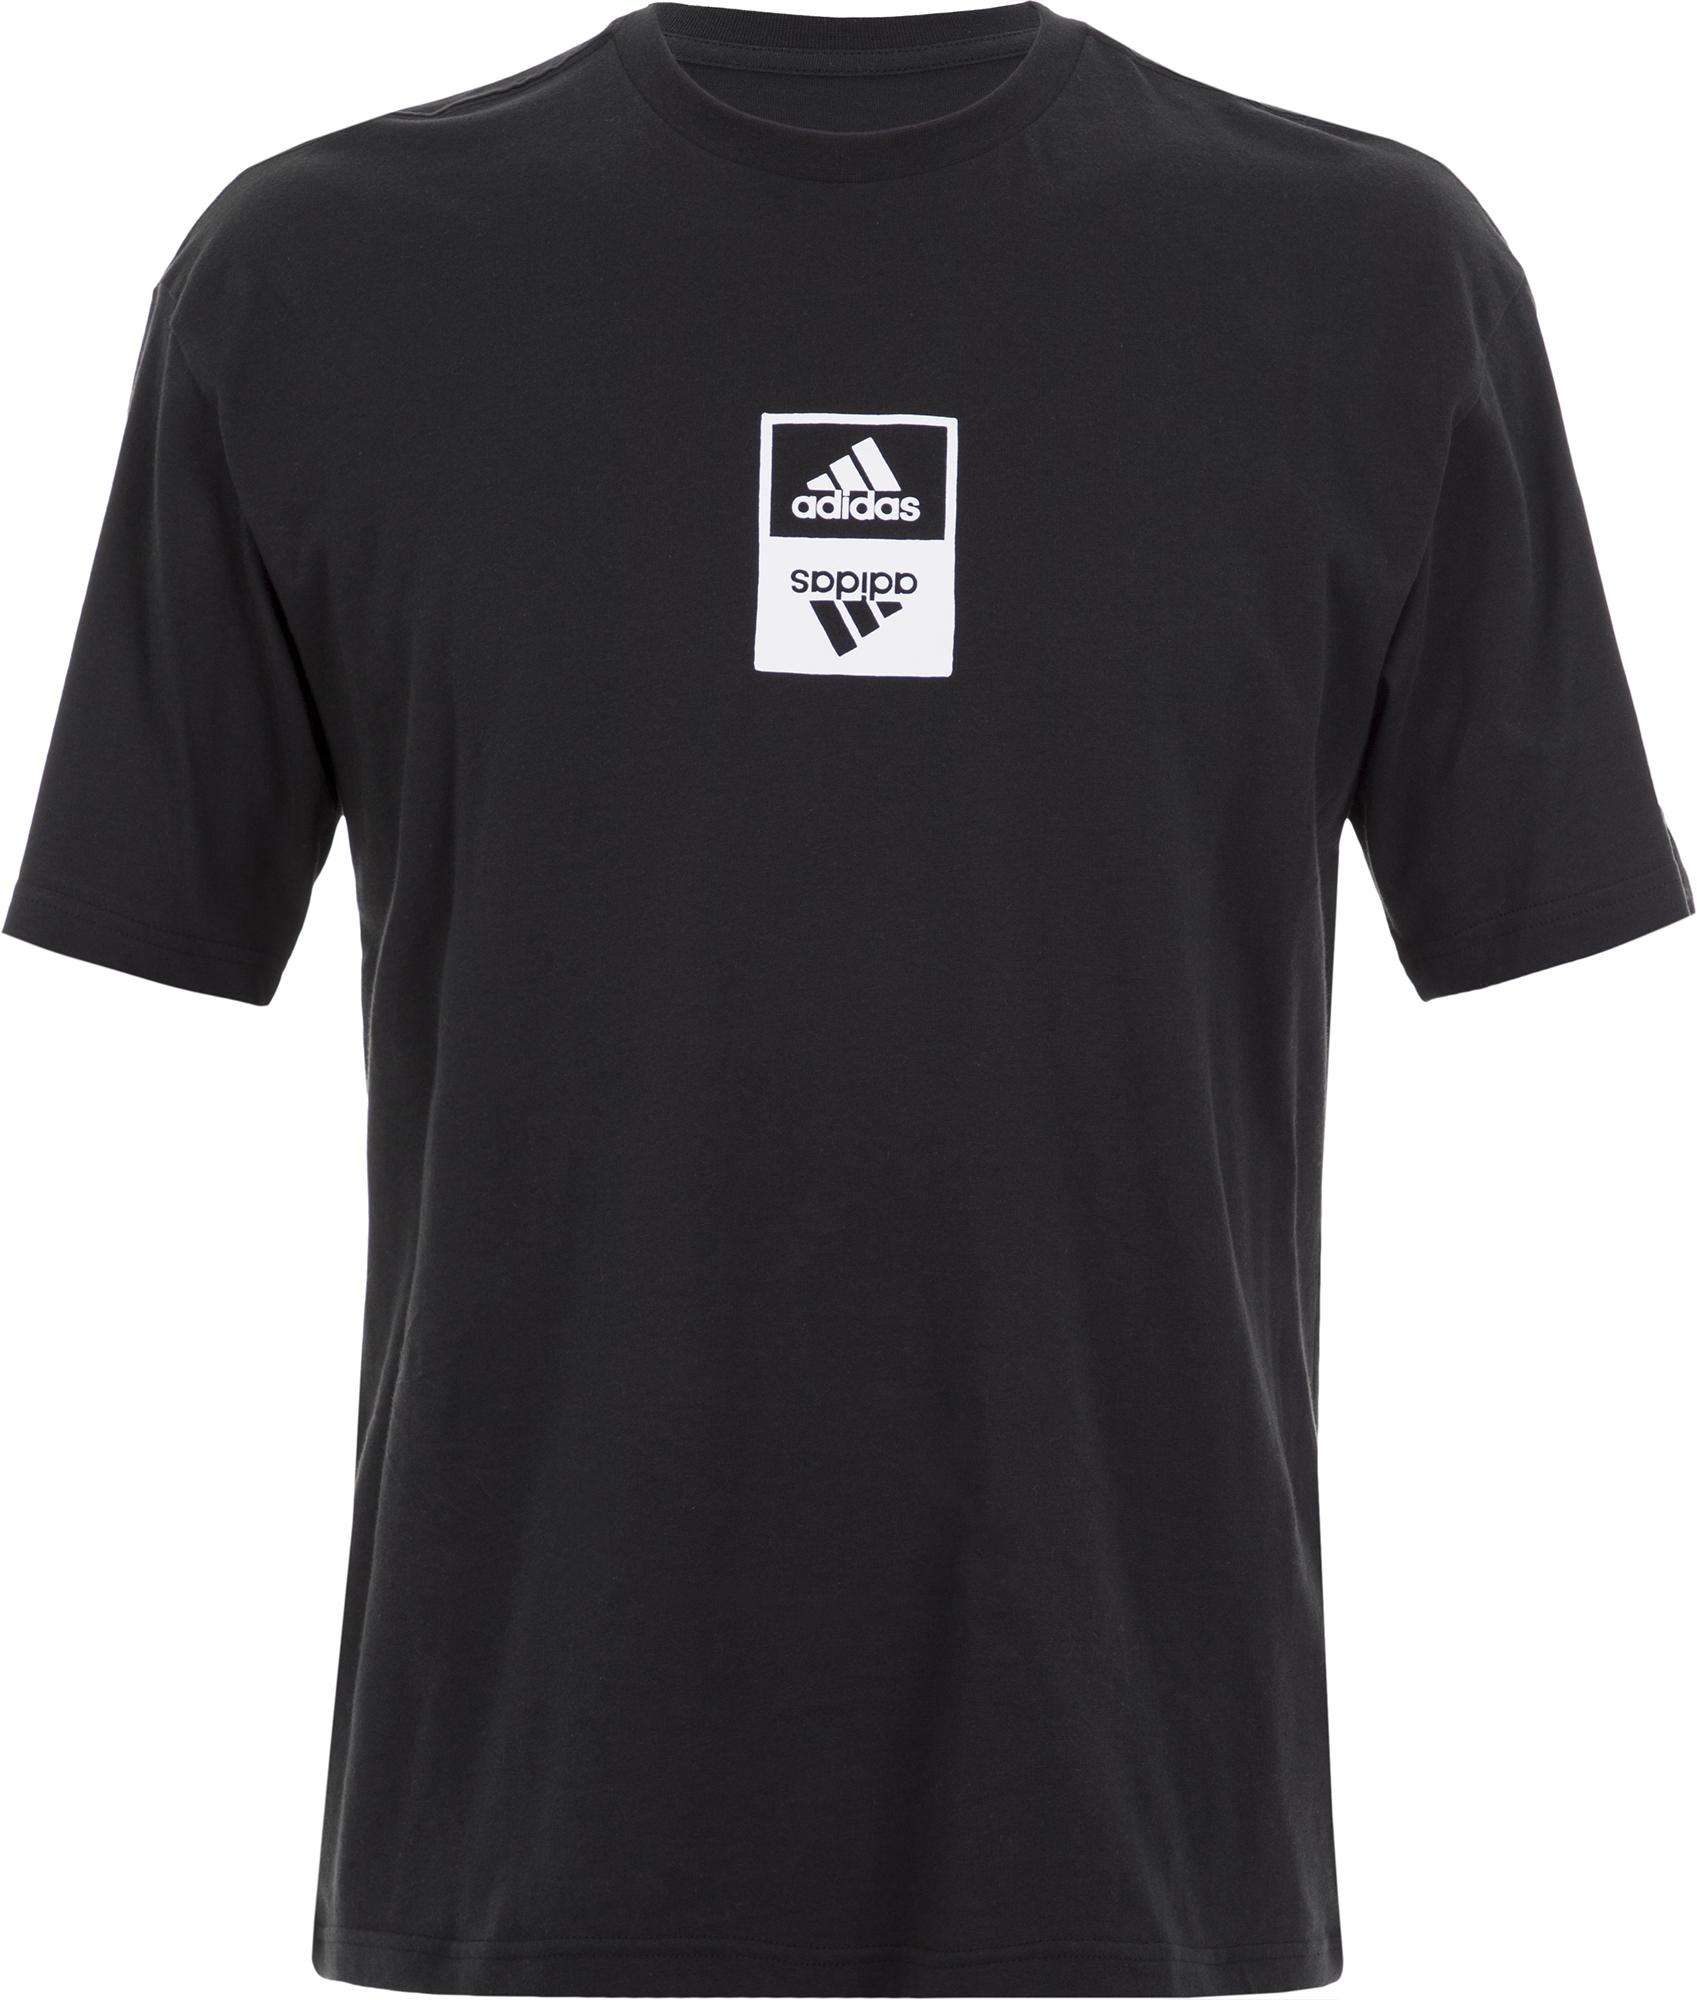 Adidas Футболка мужская OneTeam, размер 52